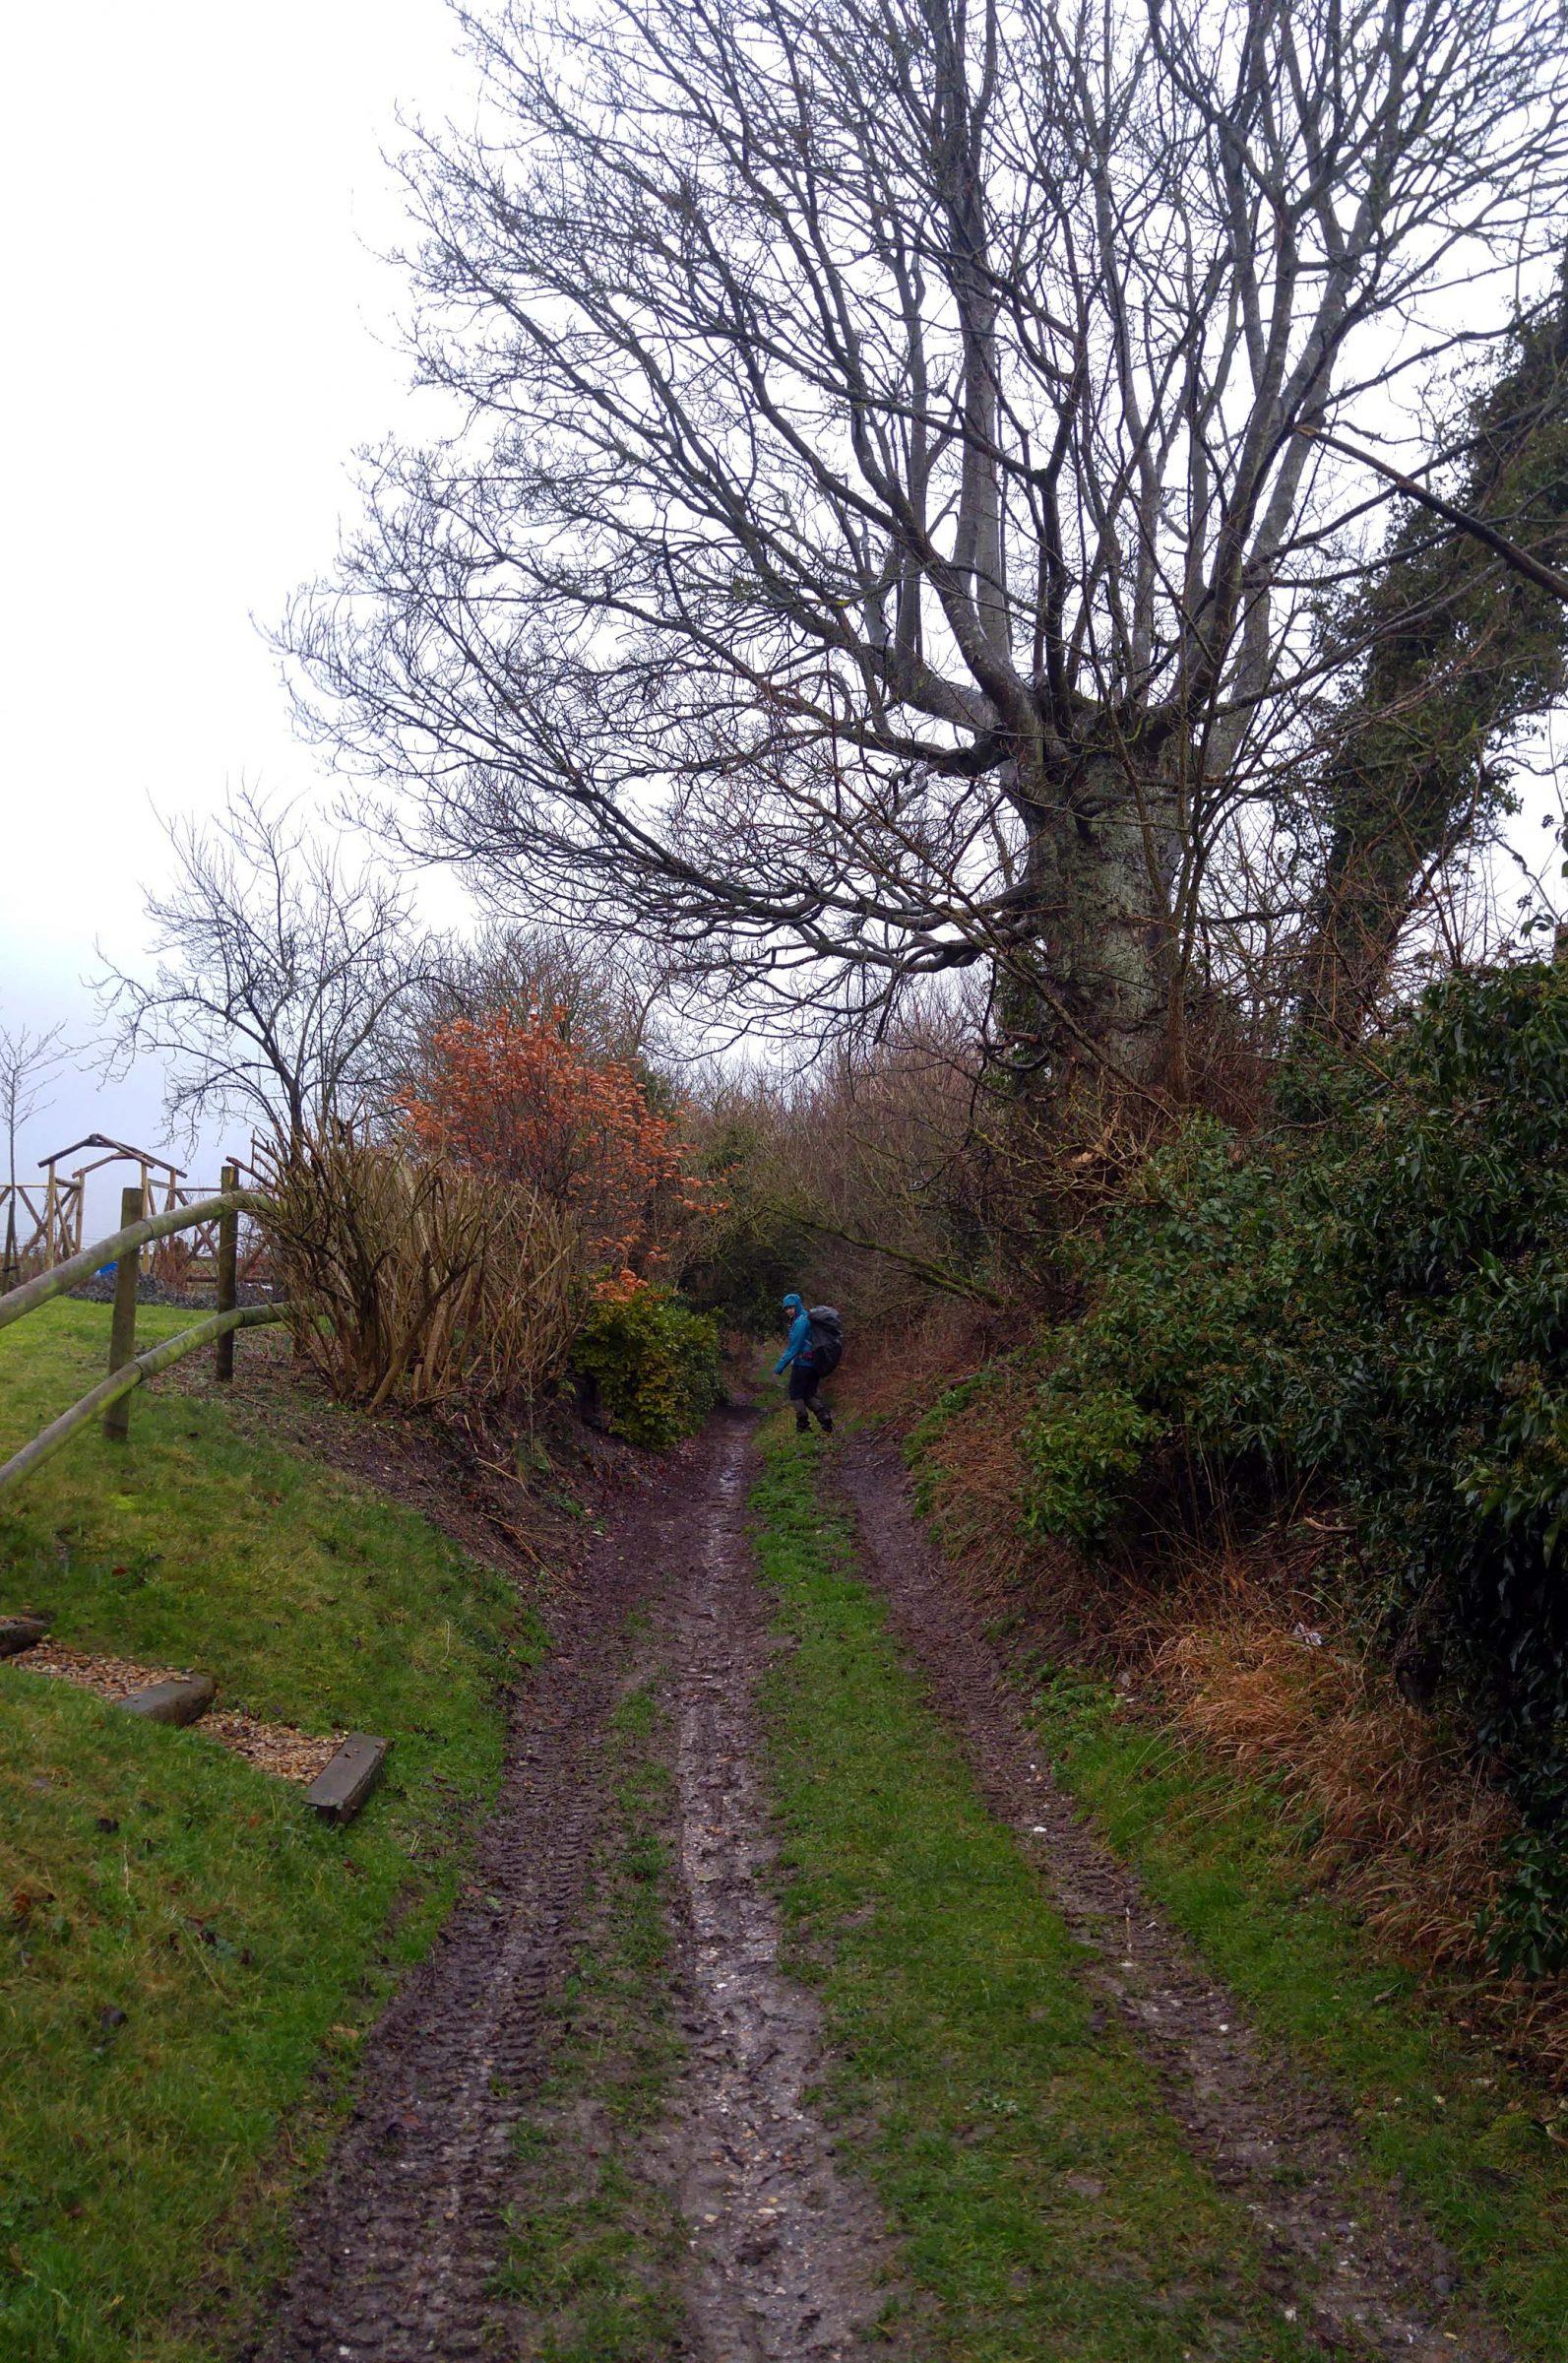 Great Stones Way long distance walking path - muddy paths